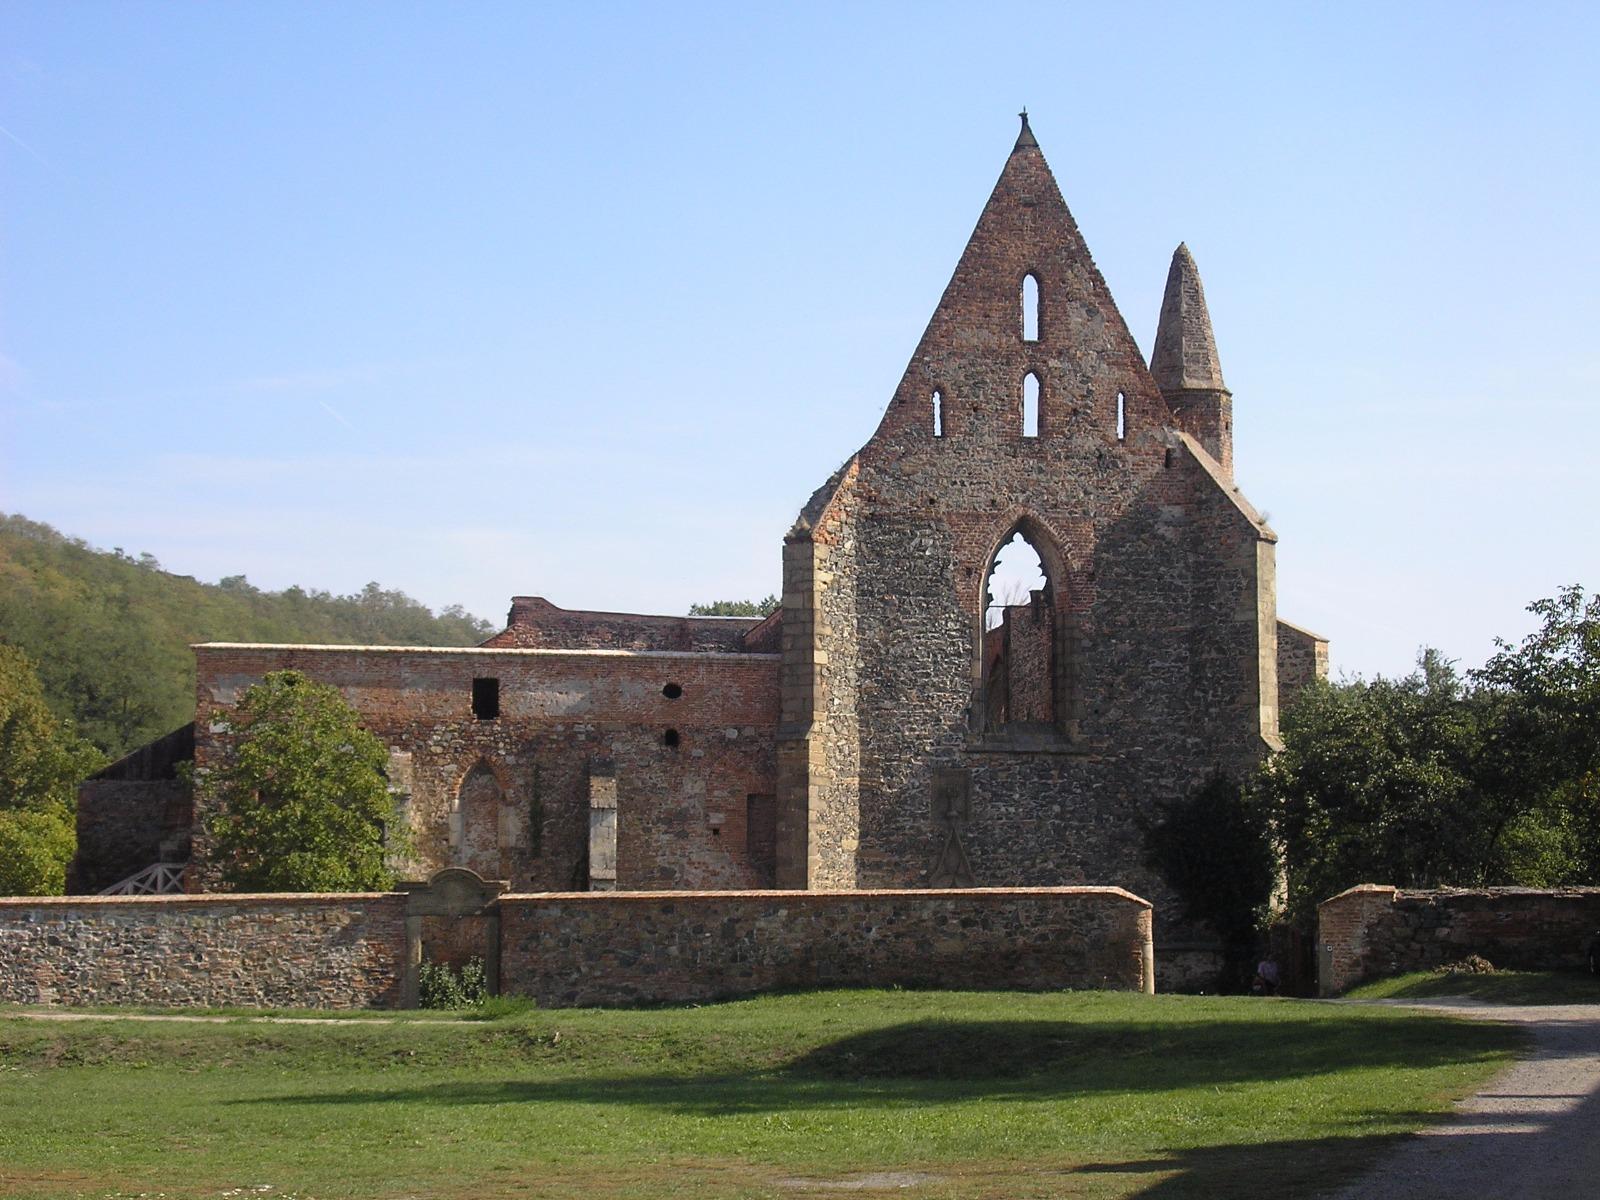 Zřícenina kláštera Rosa coeli